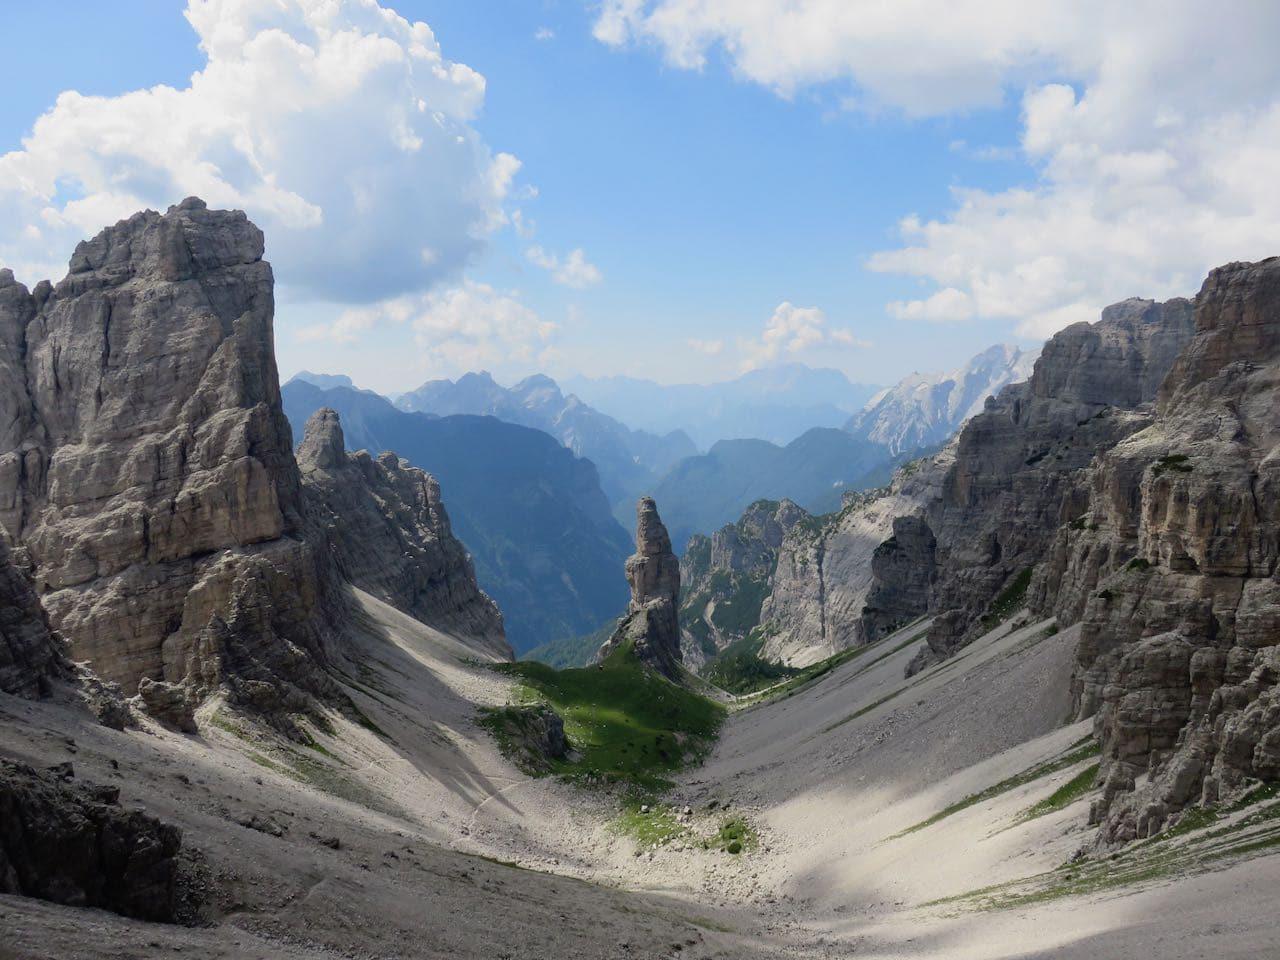 Campanile di Val Montanaia, foto di Luca Vivan, Dolomiti Friulane, blog COMINshop